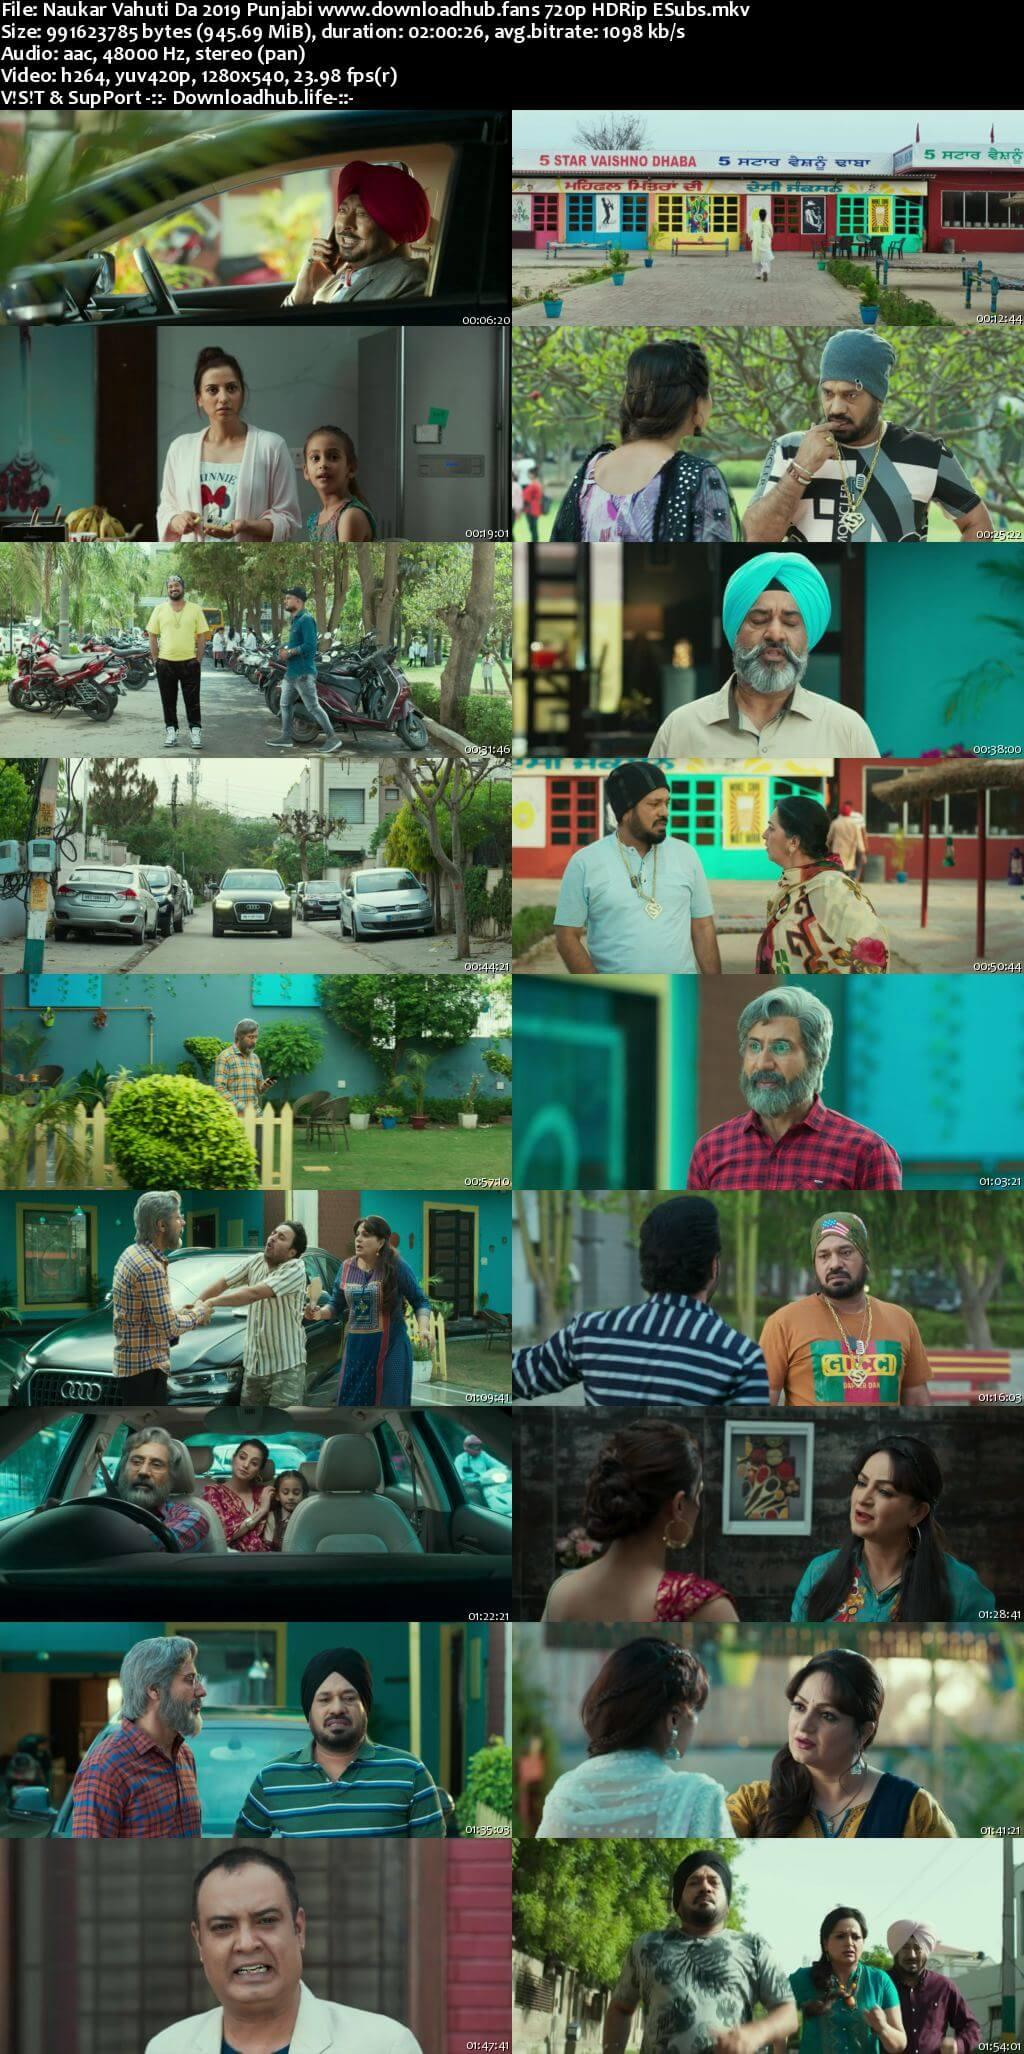 Naukar Vahuti Da 2019 Punjabi 720p HDRip ESubs